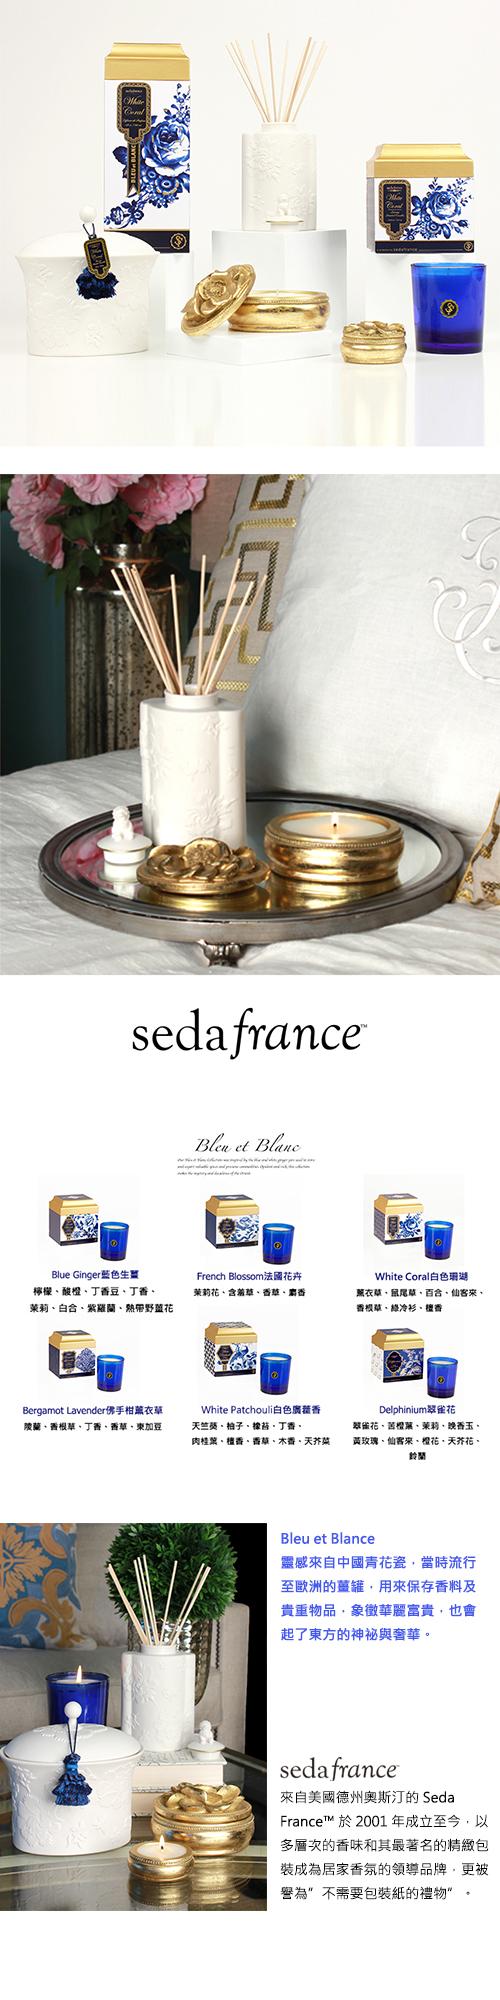 seda france 藍與白系列 金罐 (中) 白色廣藿香